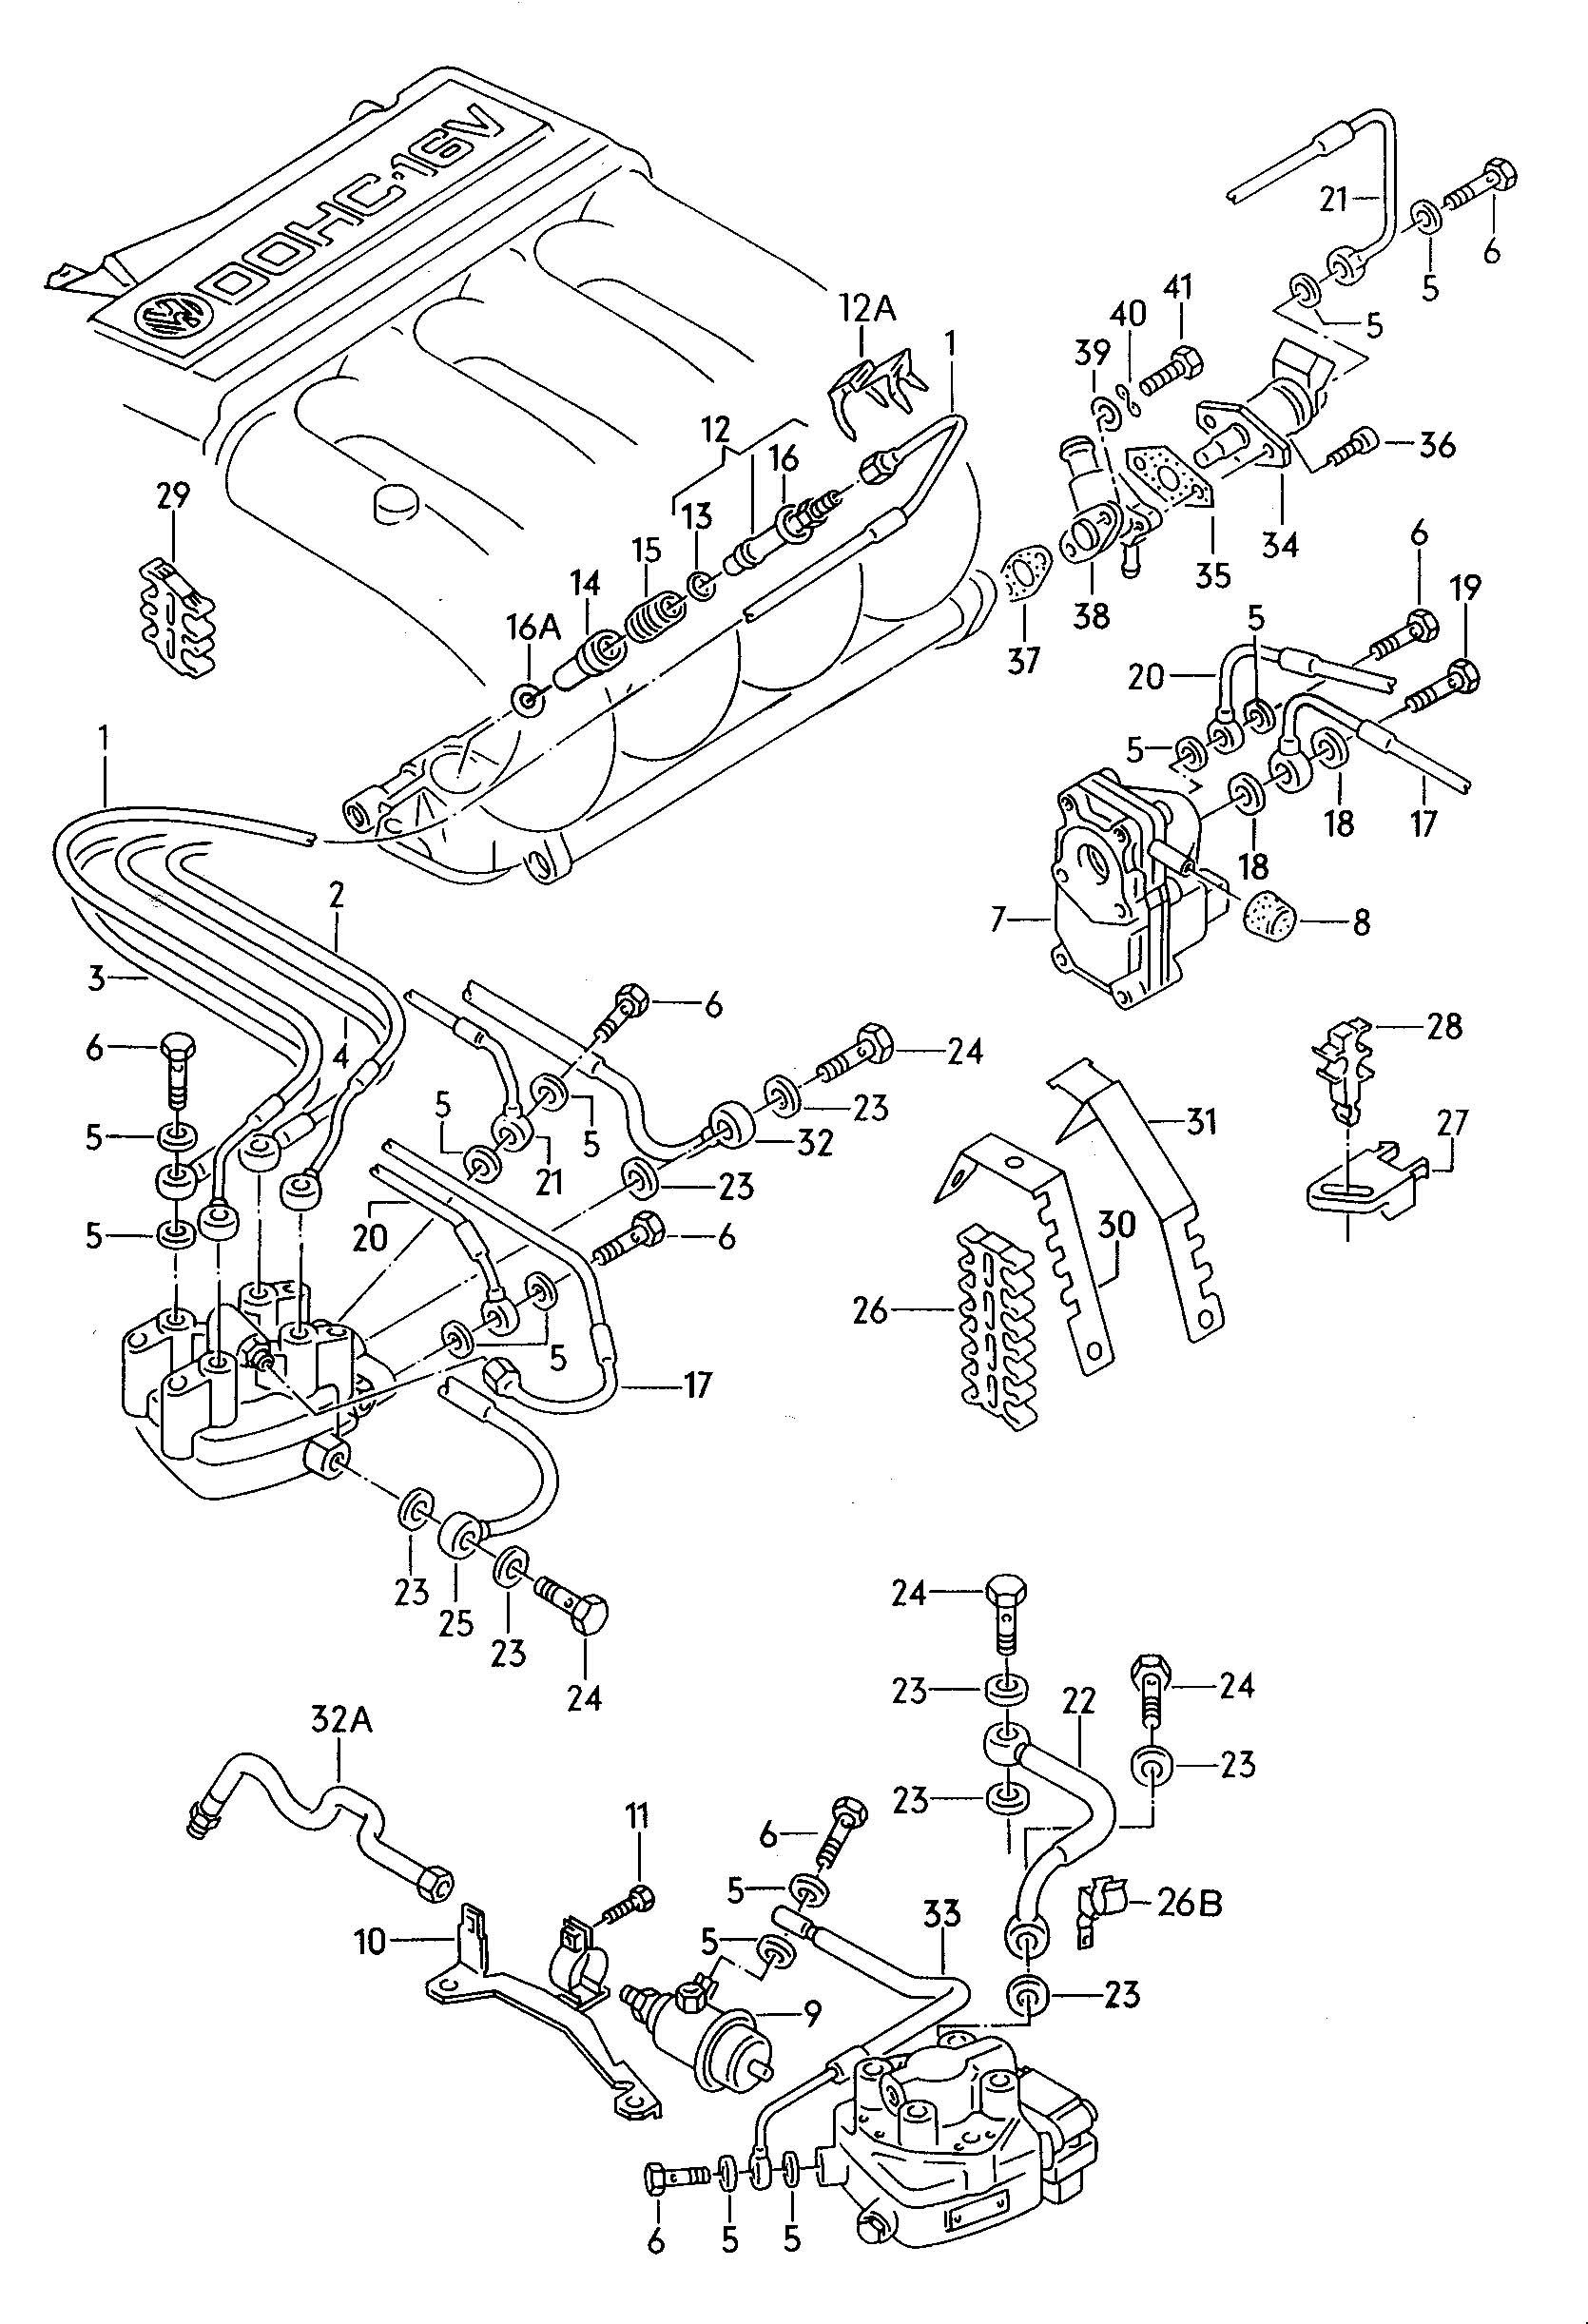 Wiring Manual Cc Vw Engine Diagram